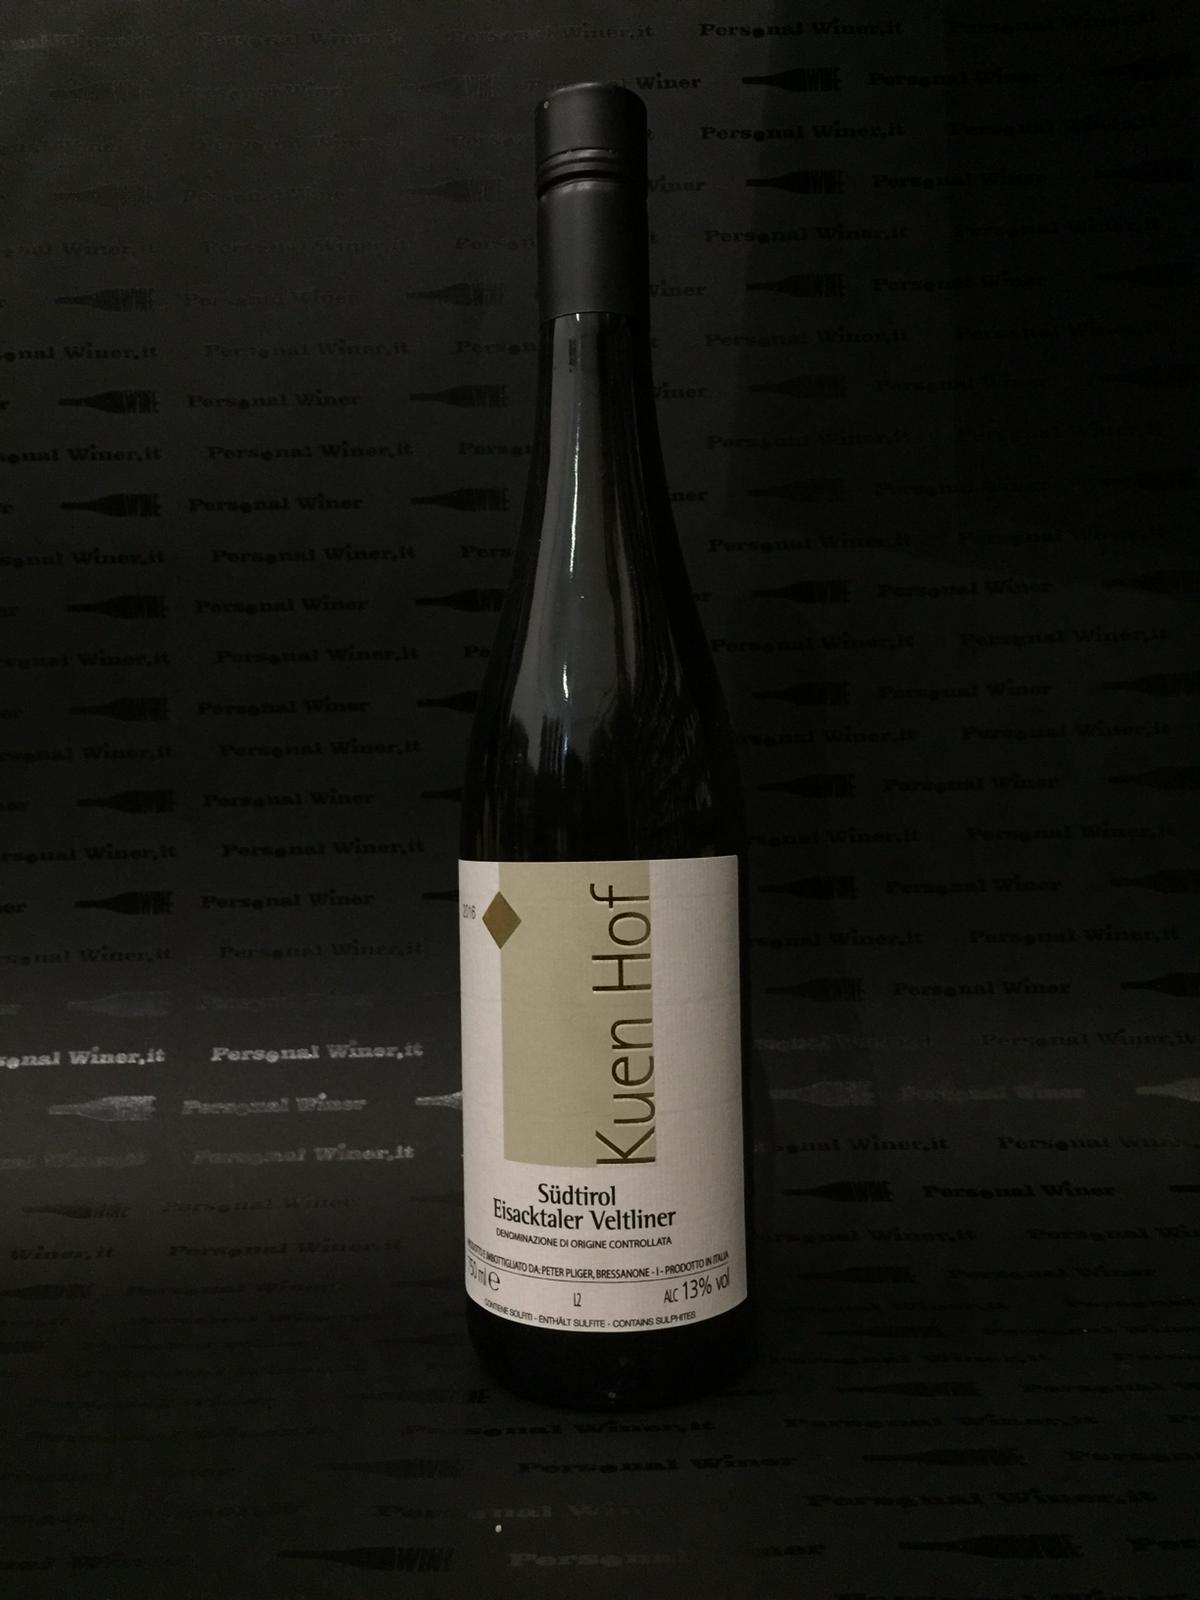 contemporaneo-food-personal-winer-torino